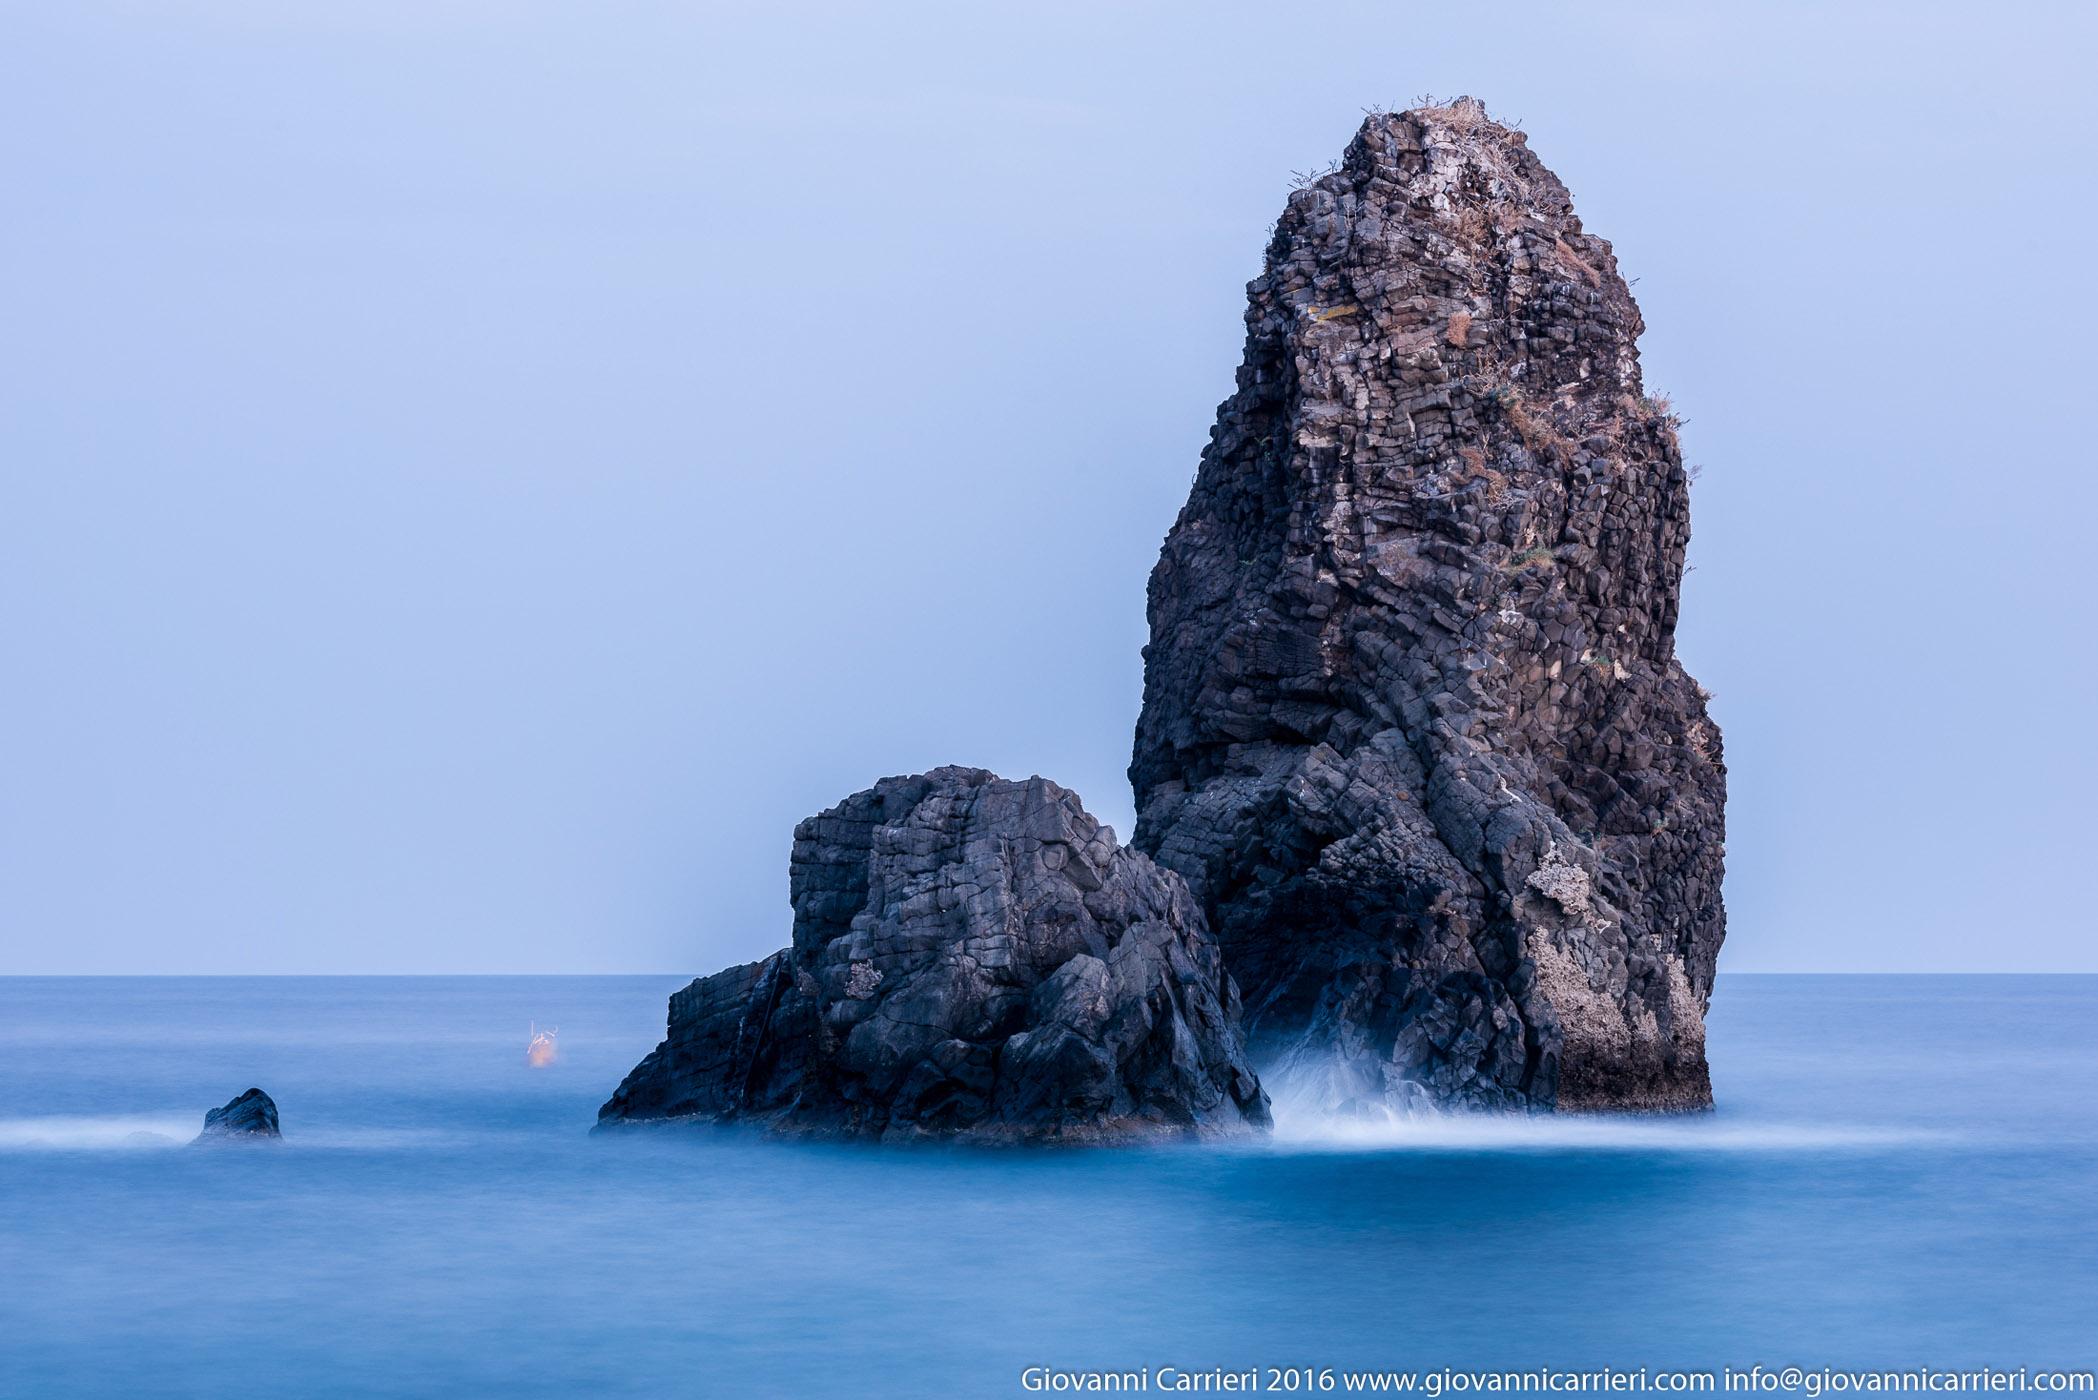 Aci Trezza ed il Mar Ionio